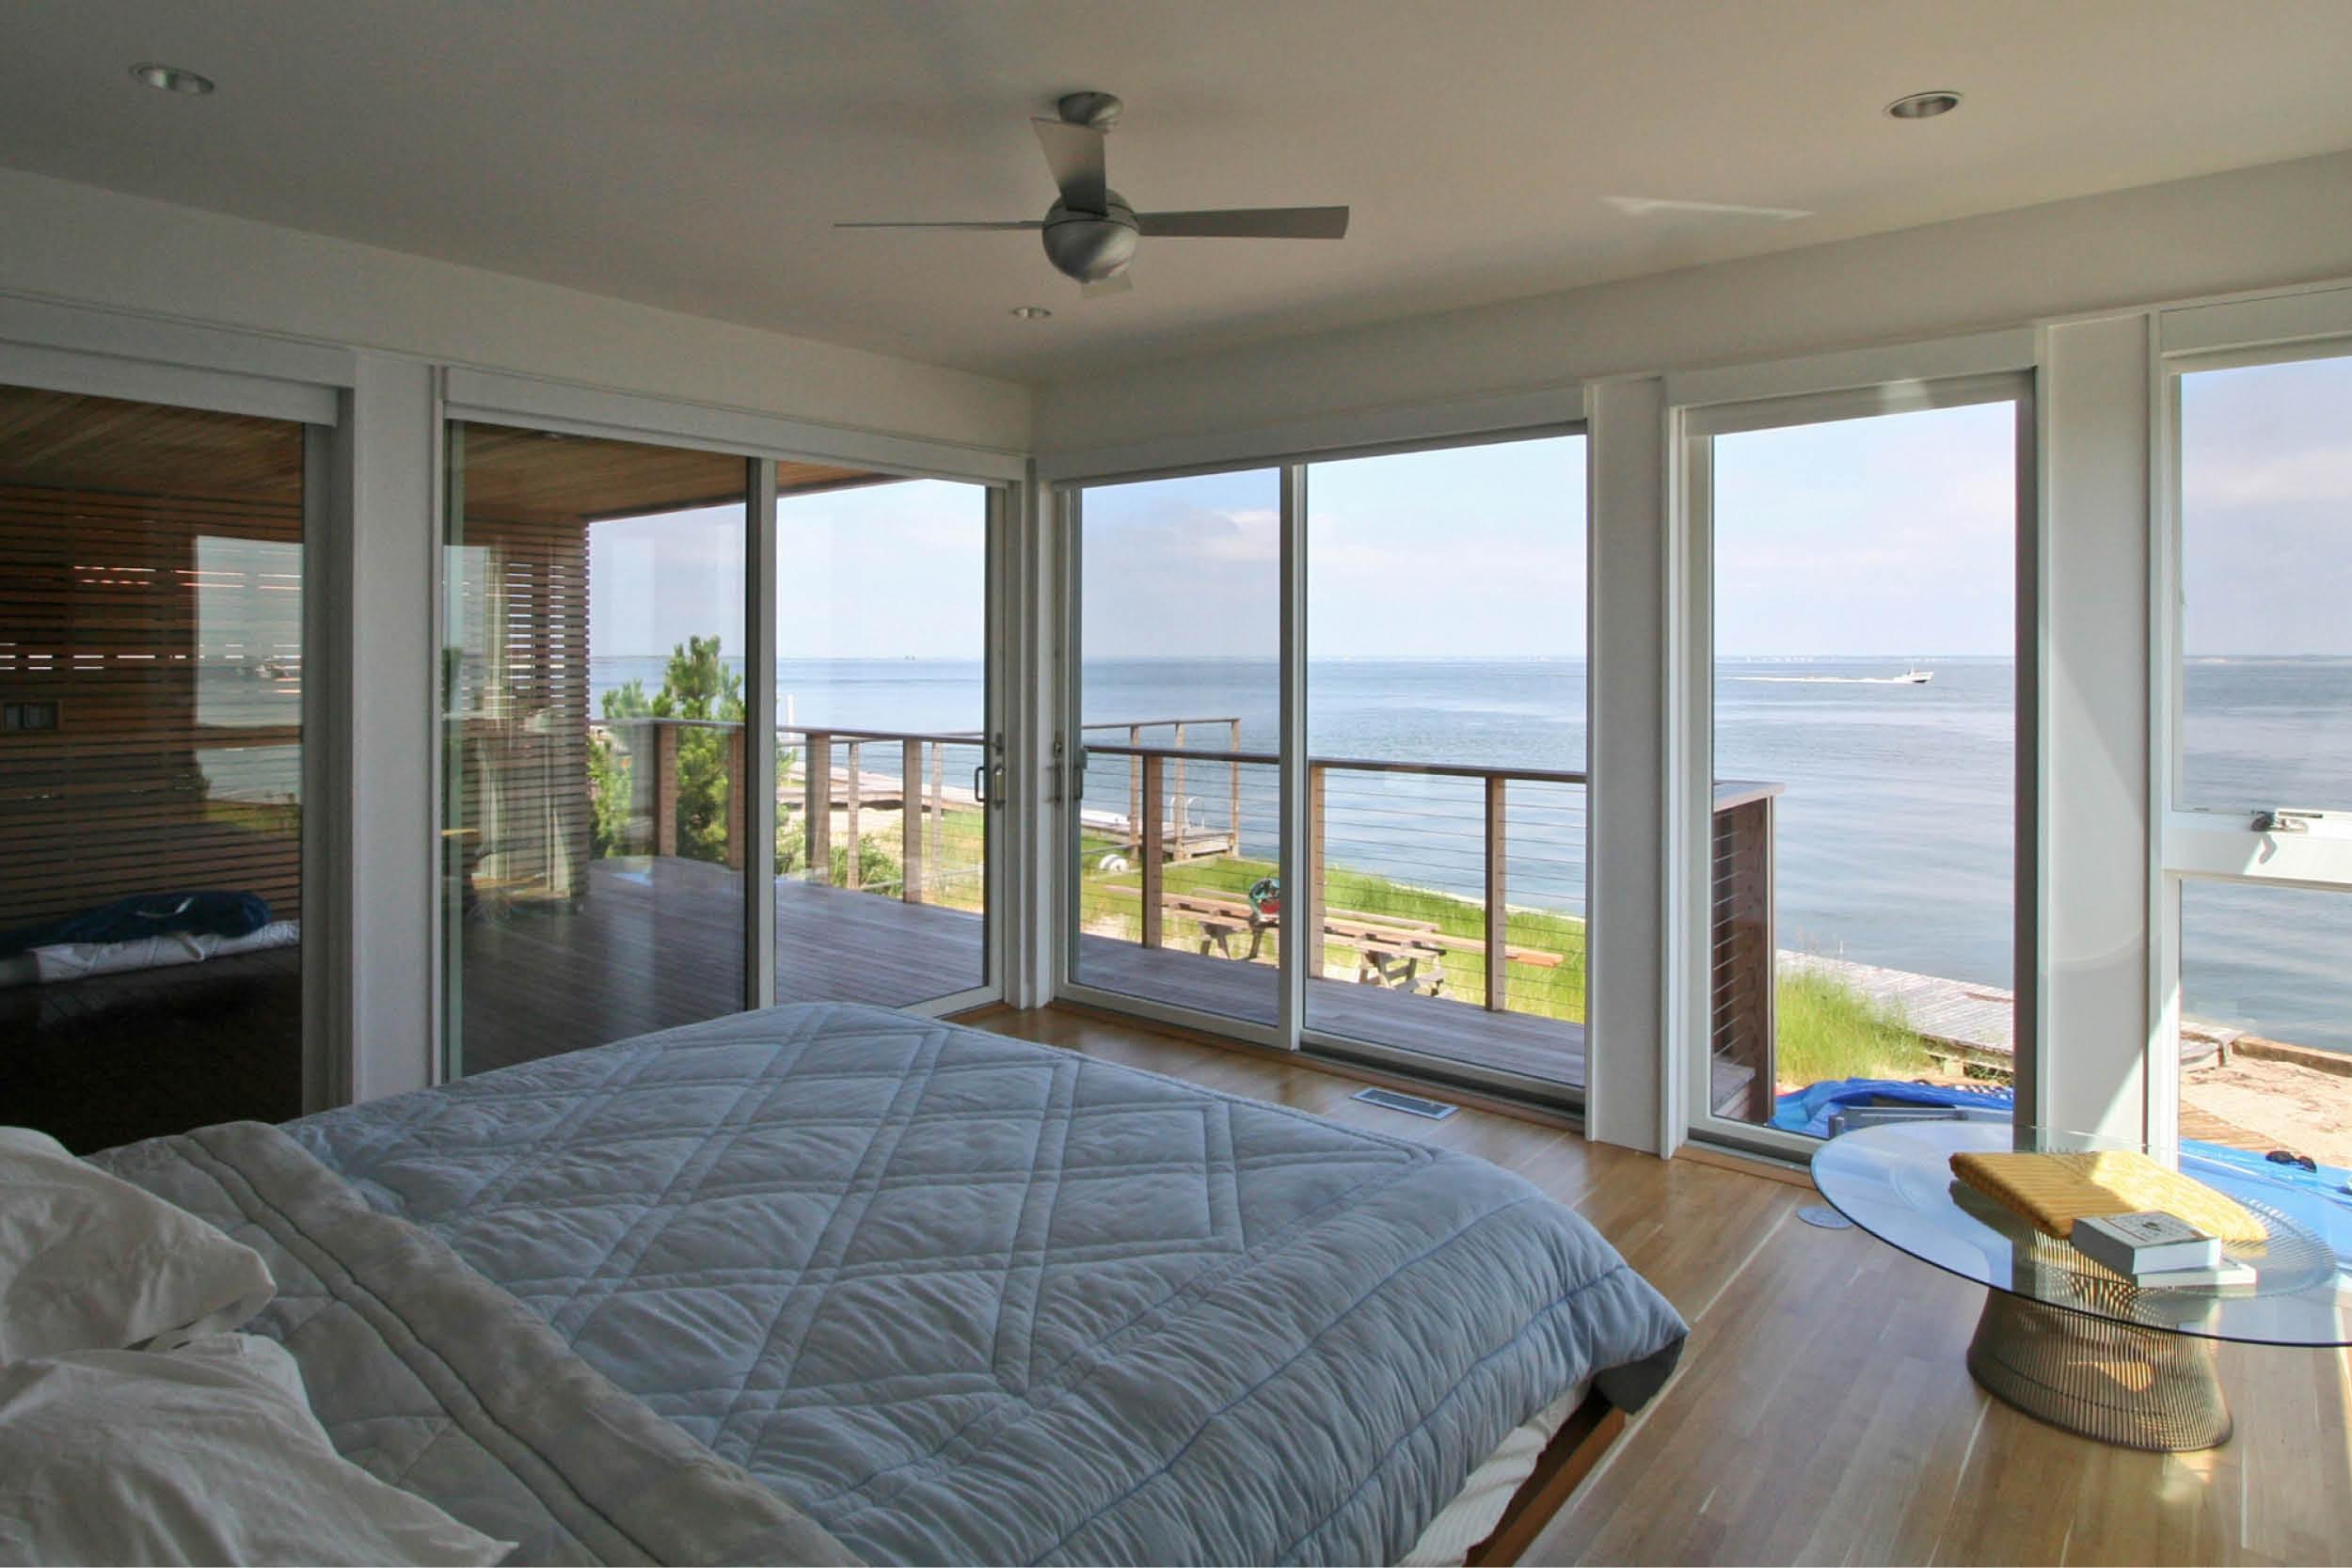 Modern Modular Prefab House | Bedroom Sliding Doors | Fire Island New York | RES4